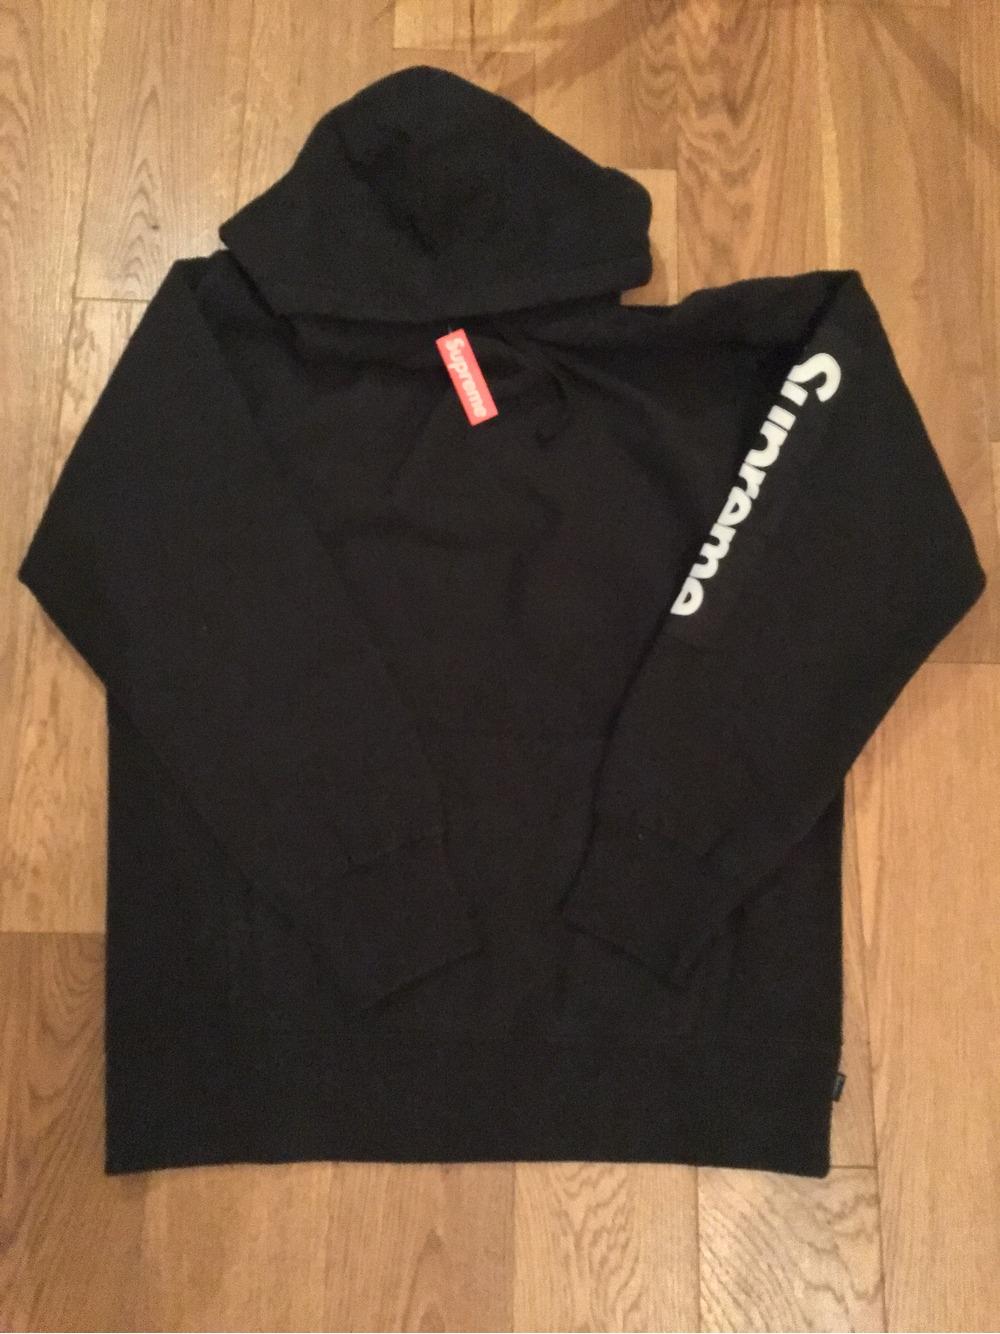 Supreme nyc sleeve patch hoodie l black box logo sade